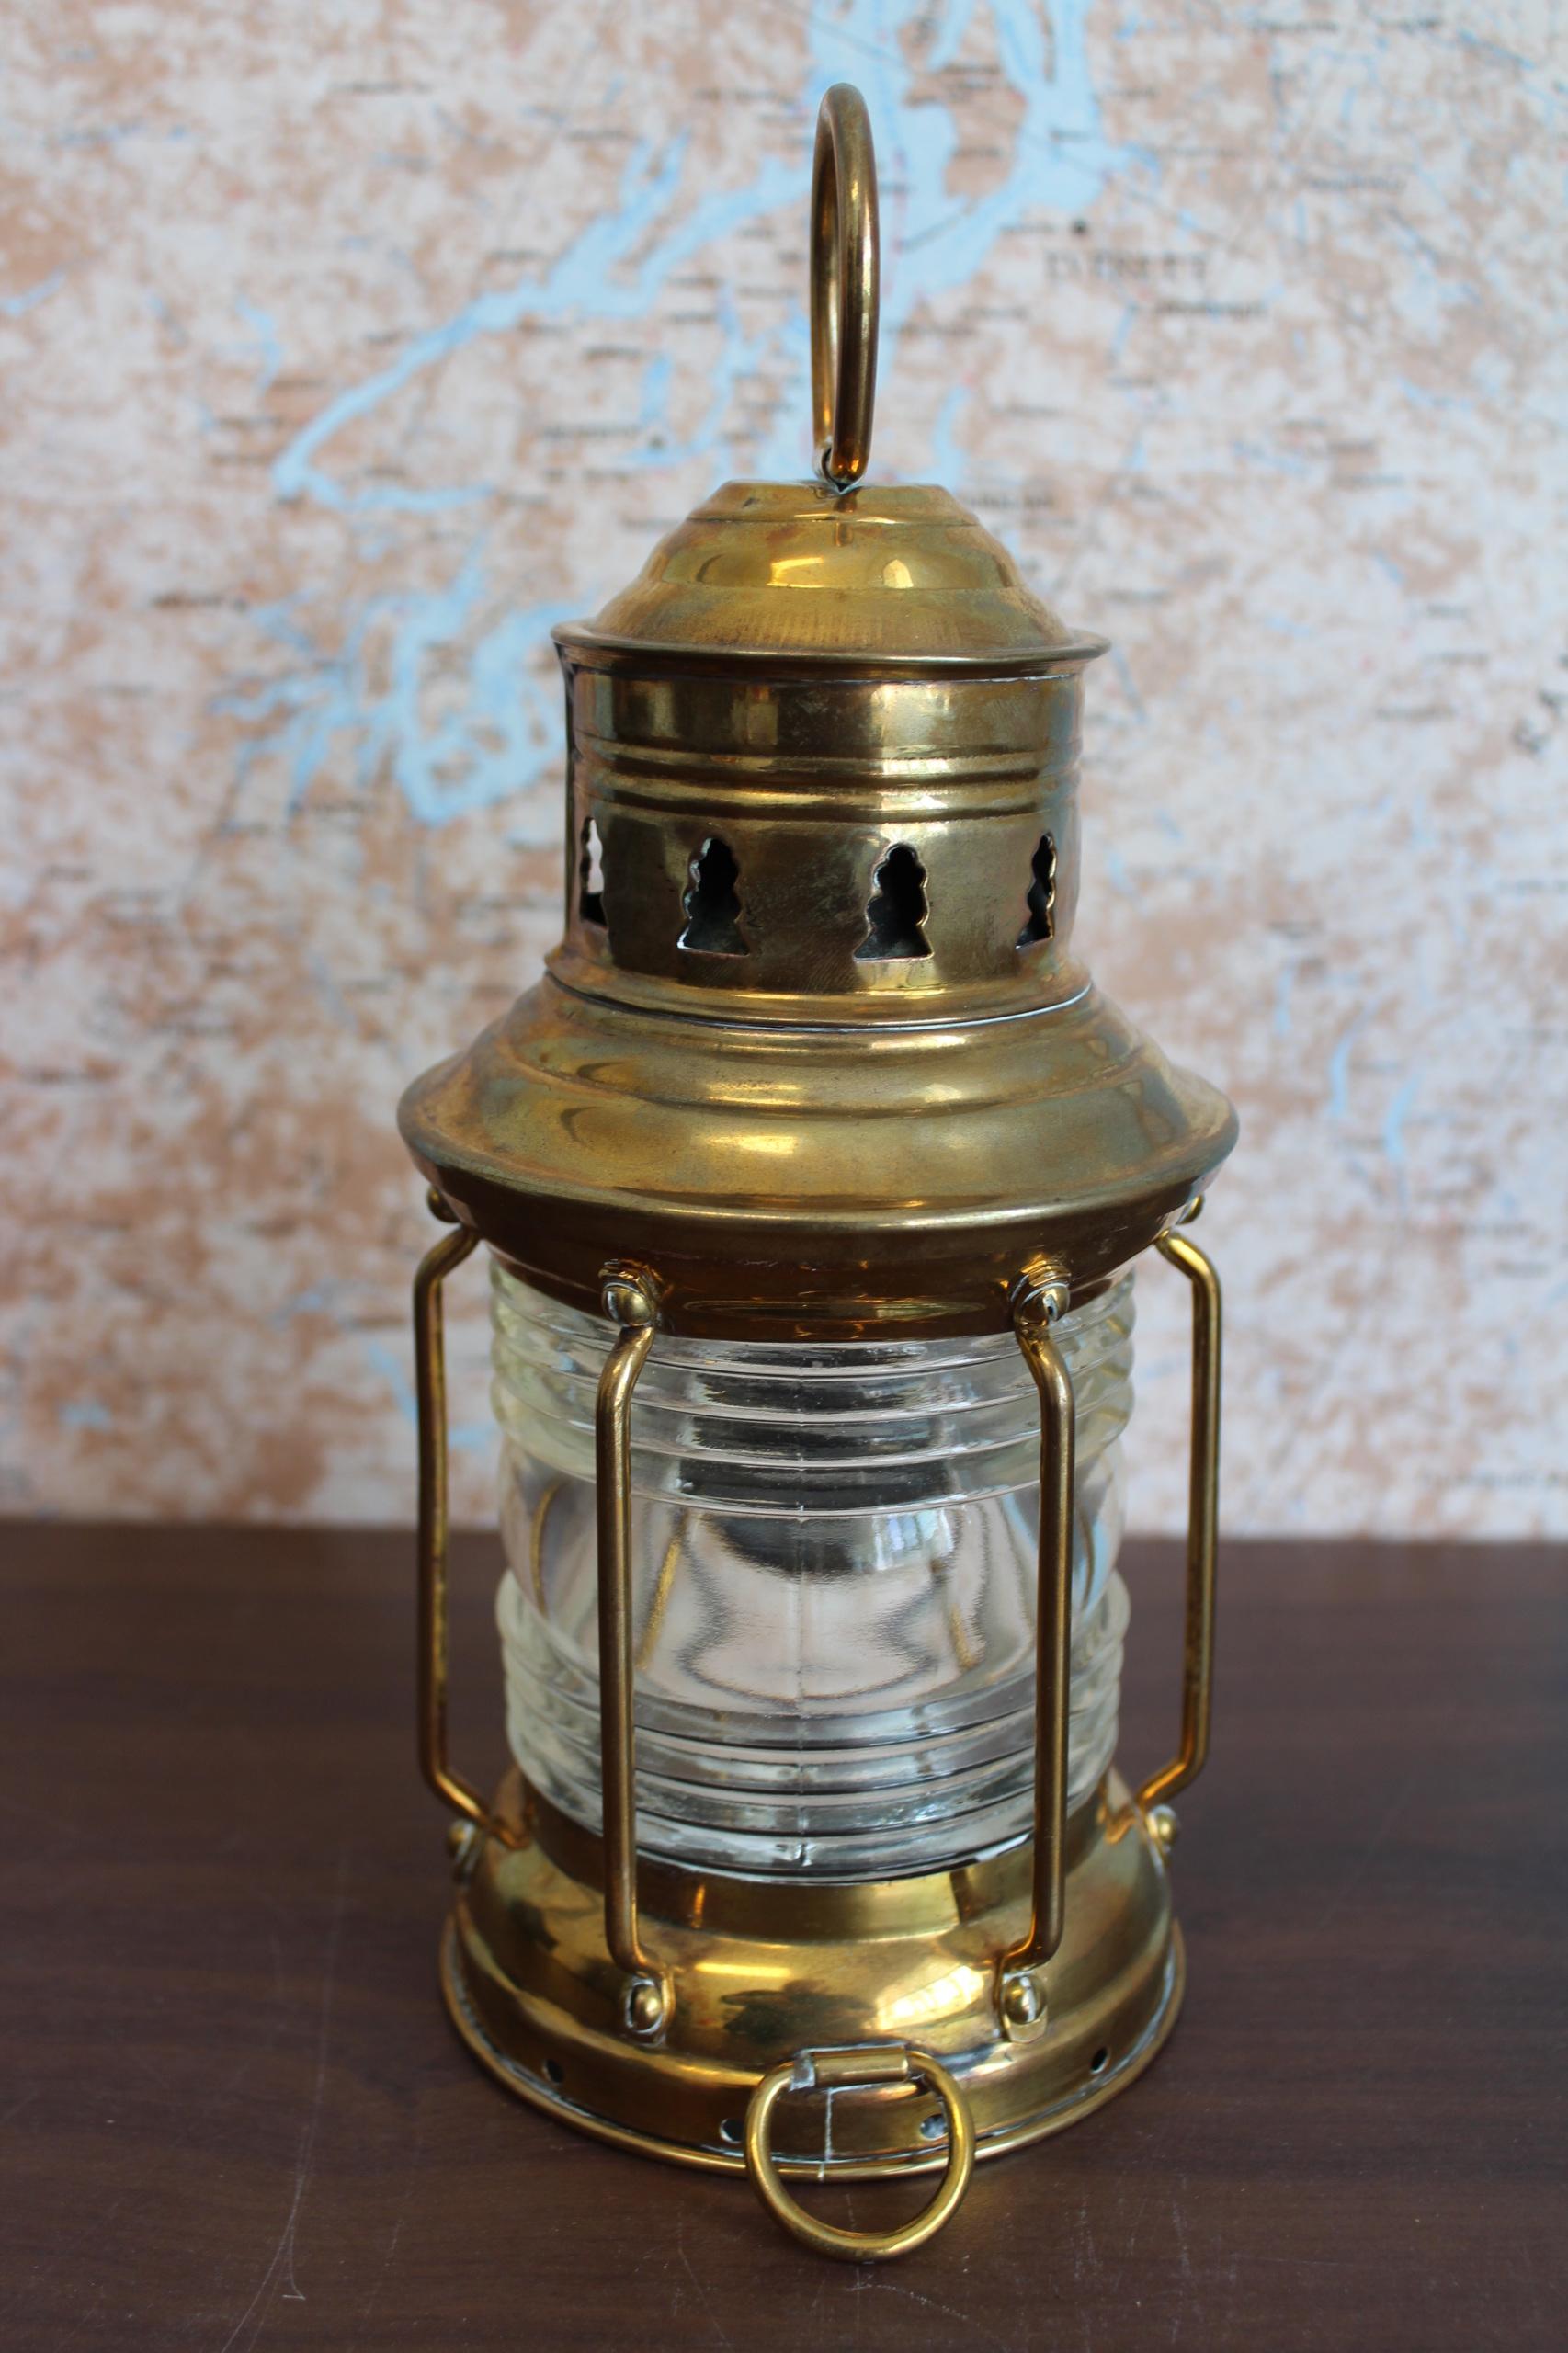 L40 Small Brass Anchor Lantern